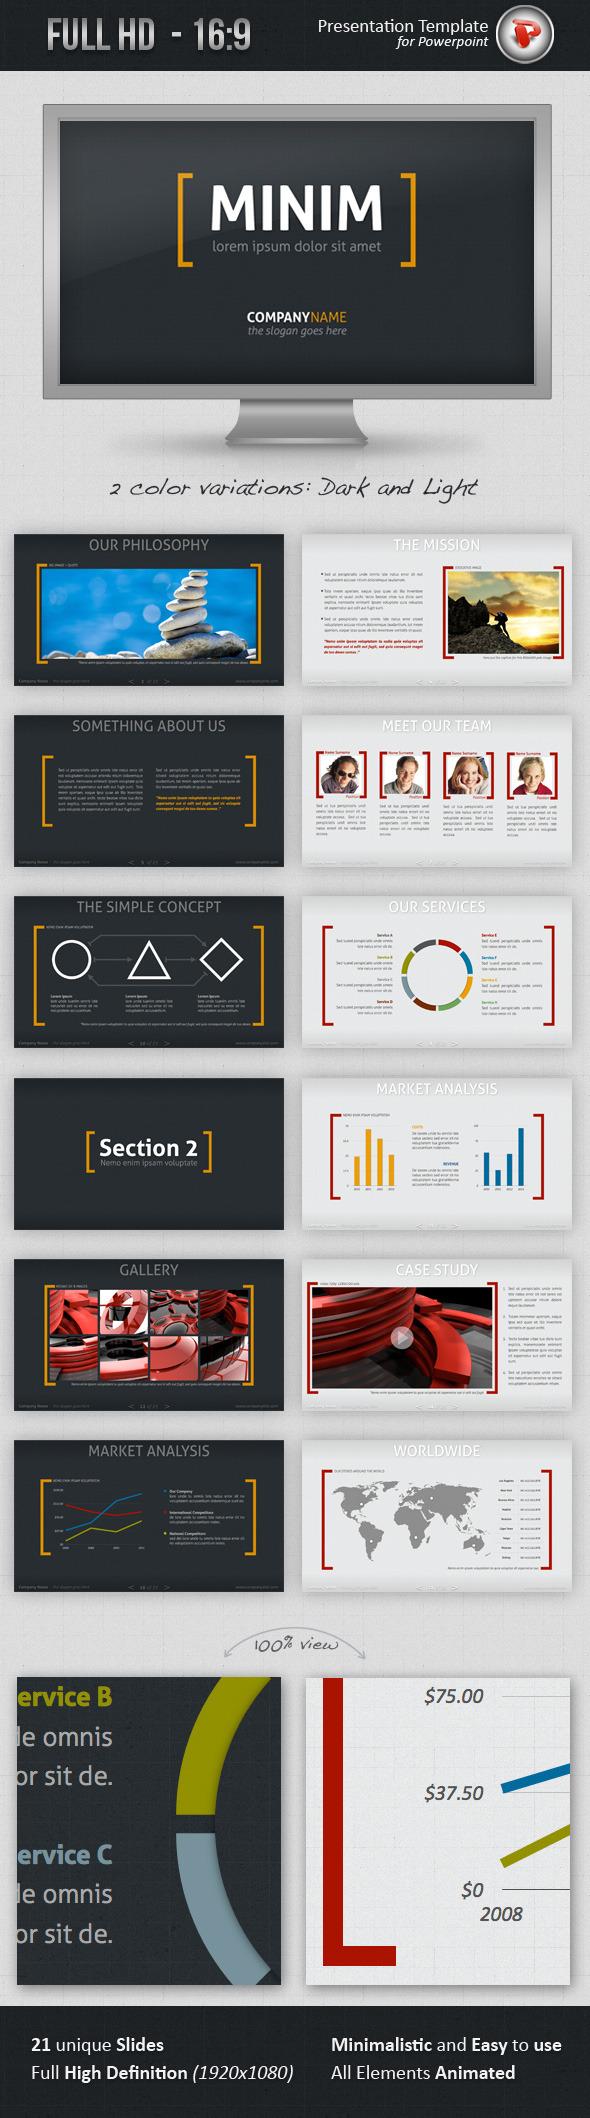 Minim Powerpoint Template - Creative PowerPoint Templates